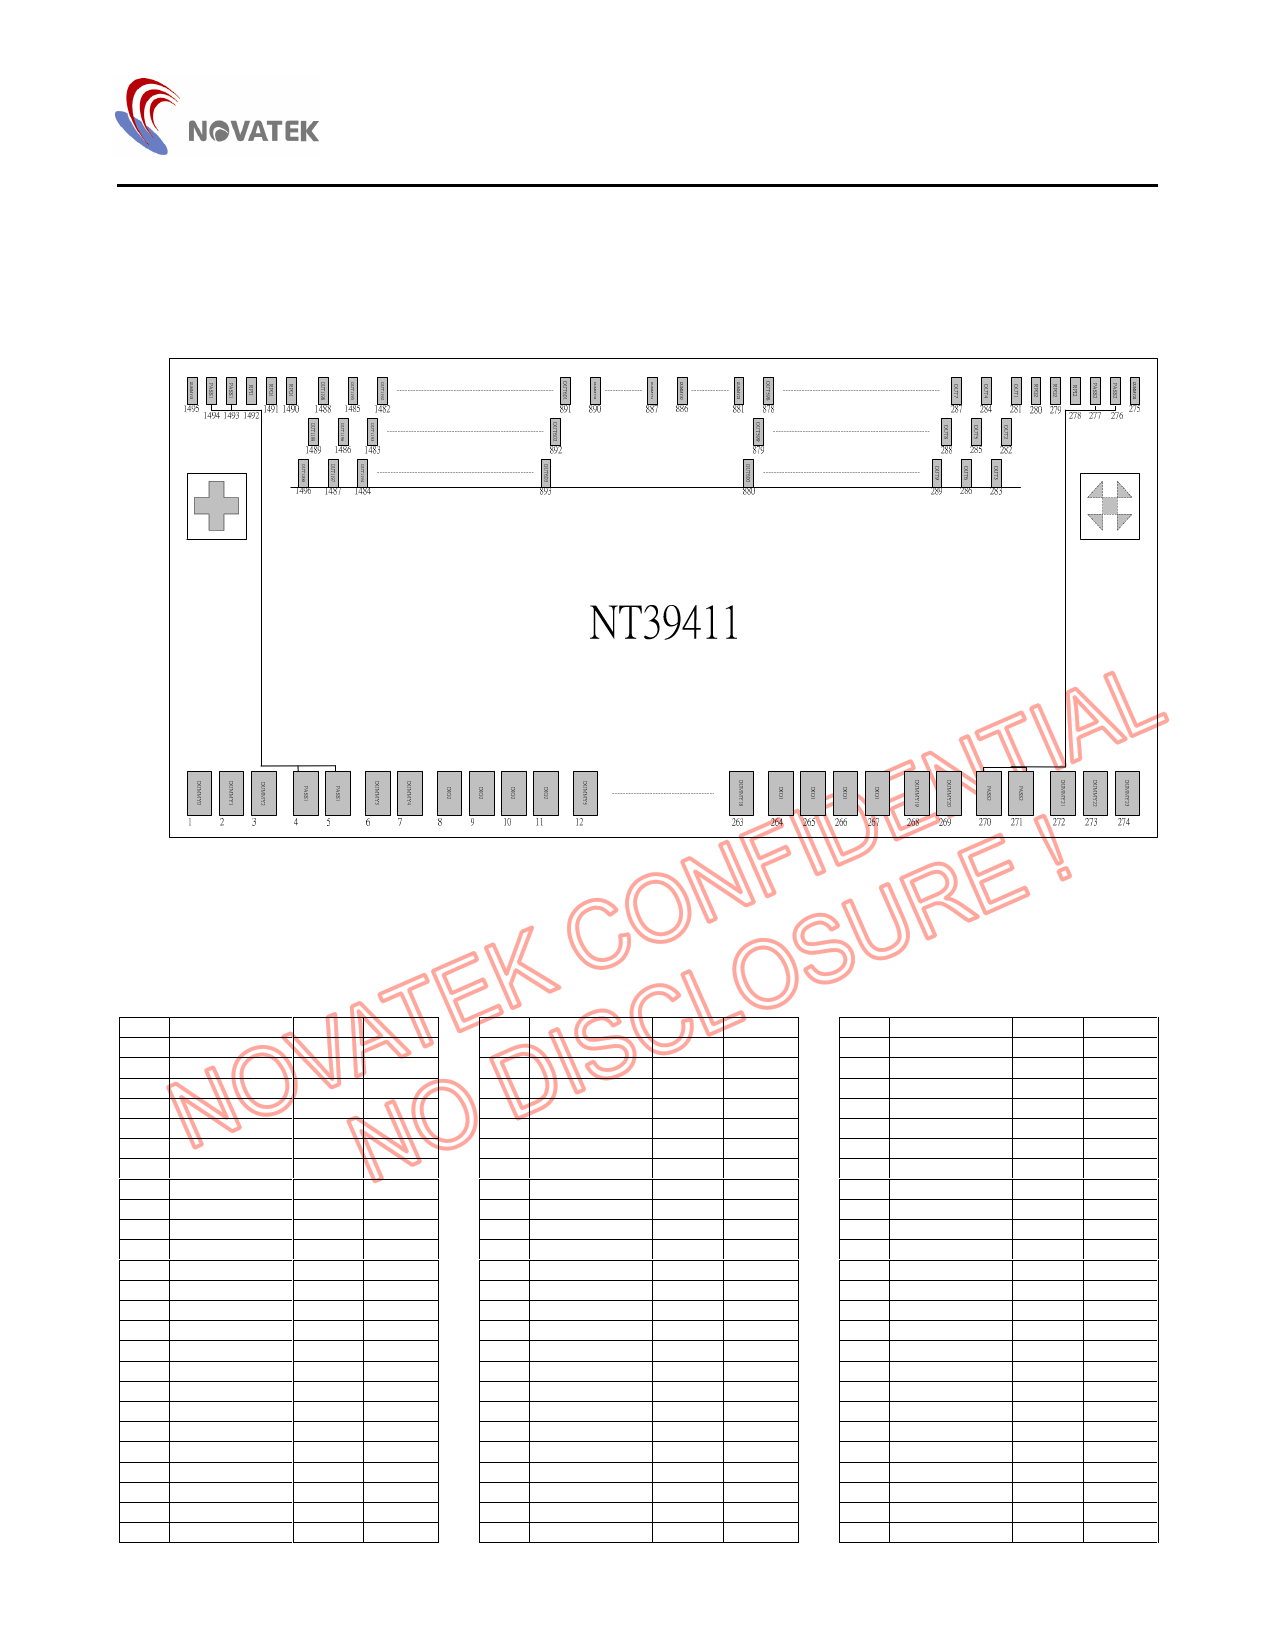 NT39411 transistor, igbt